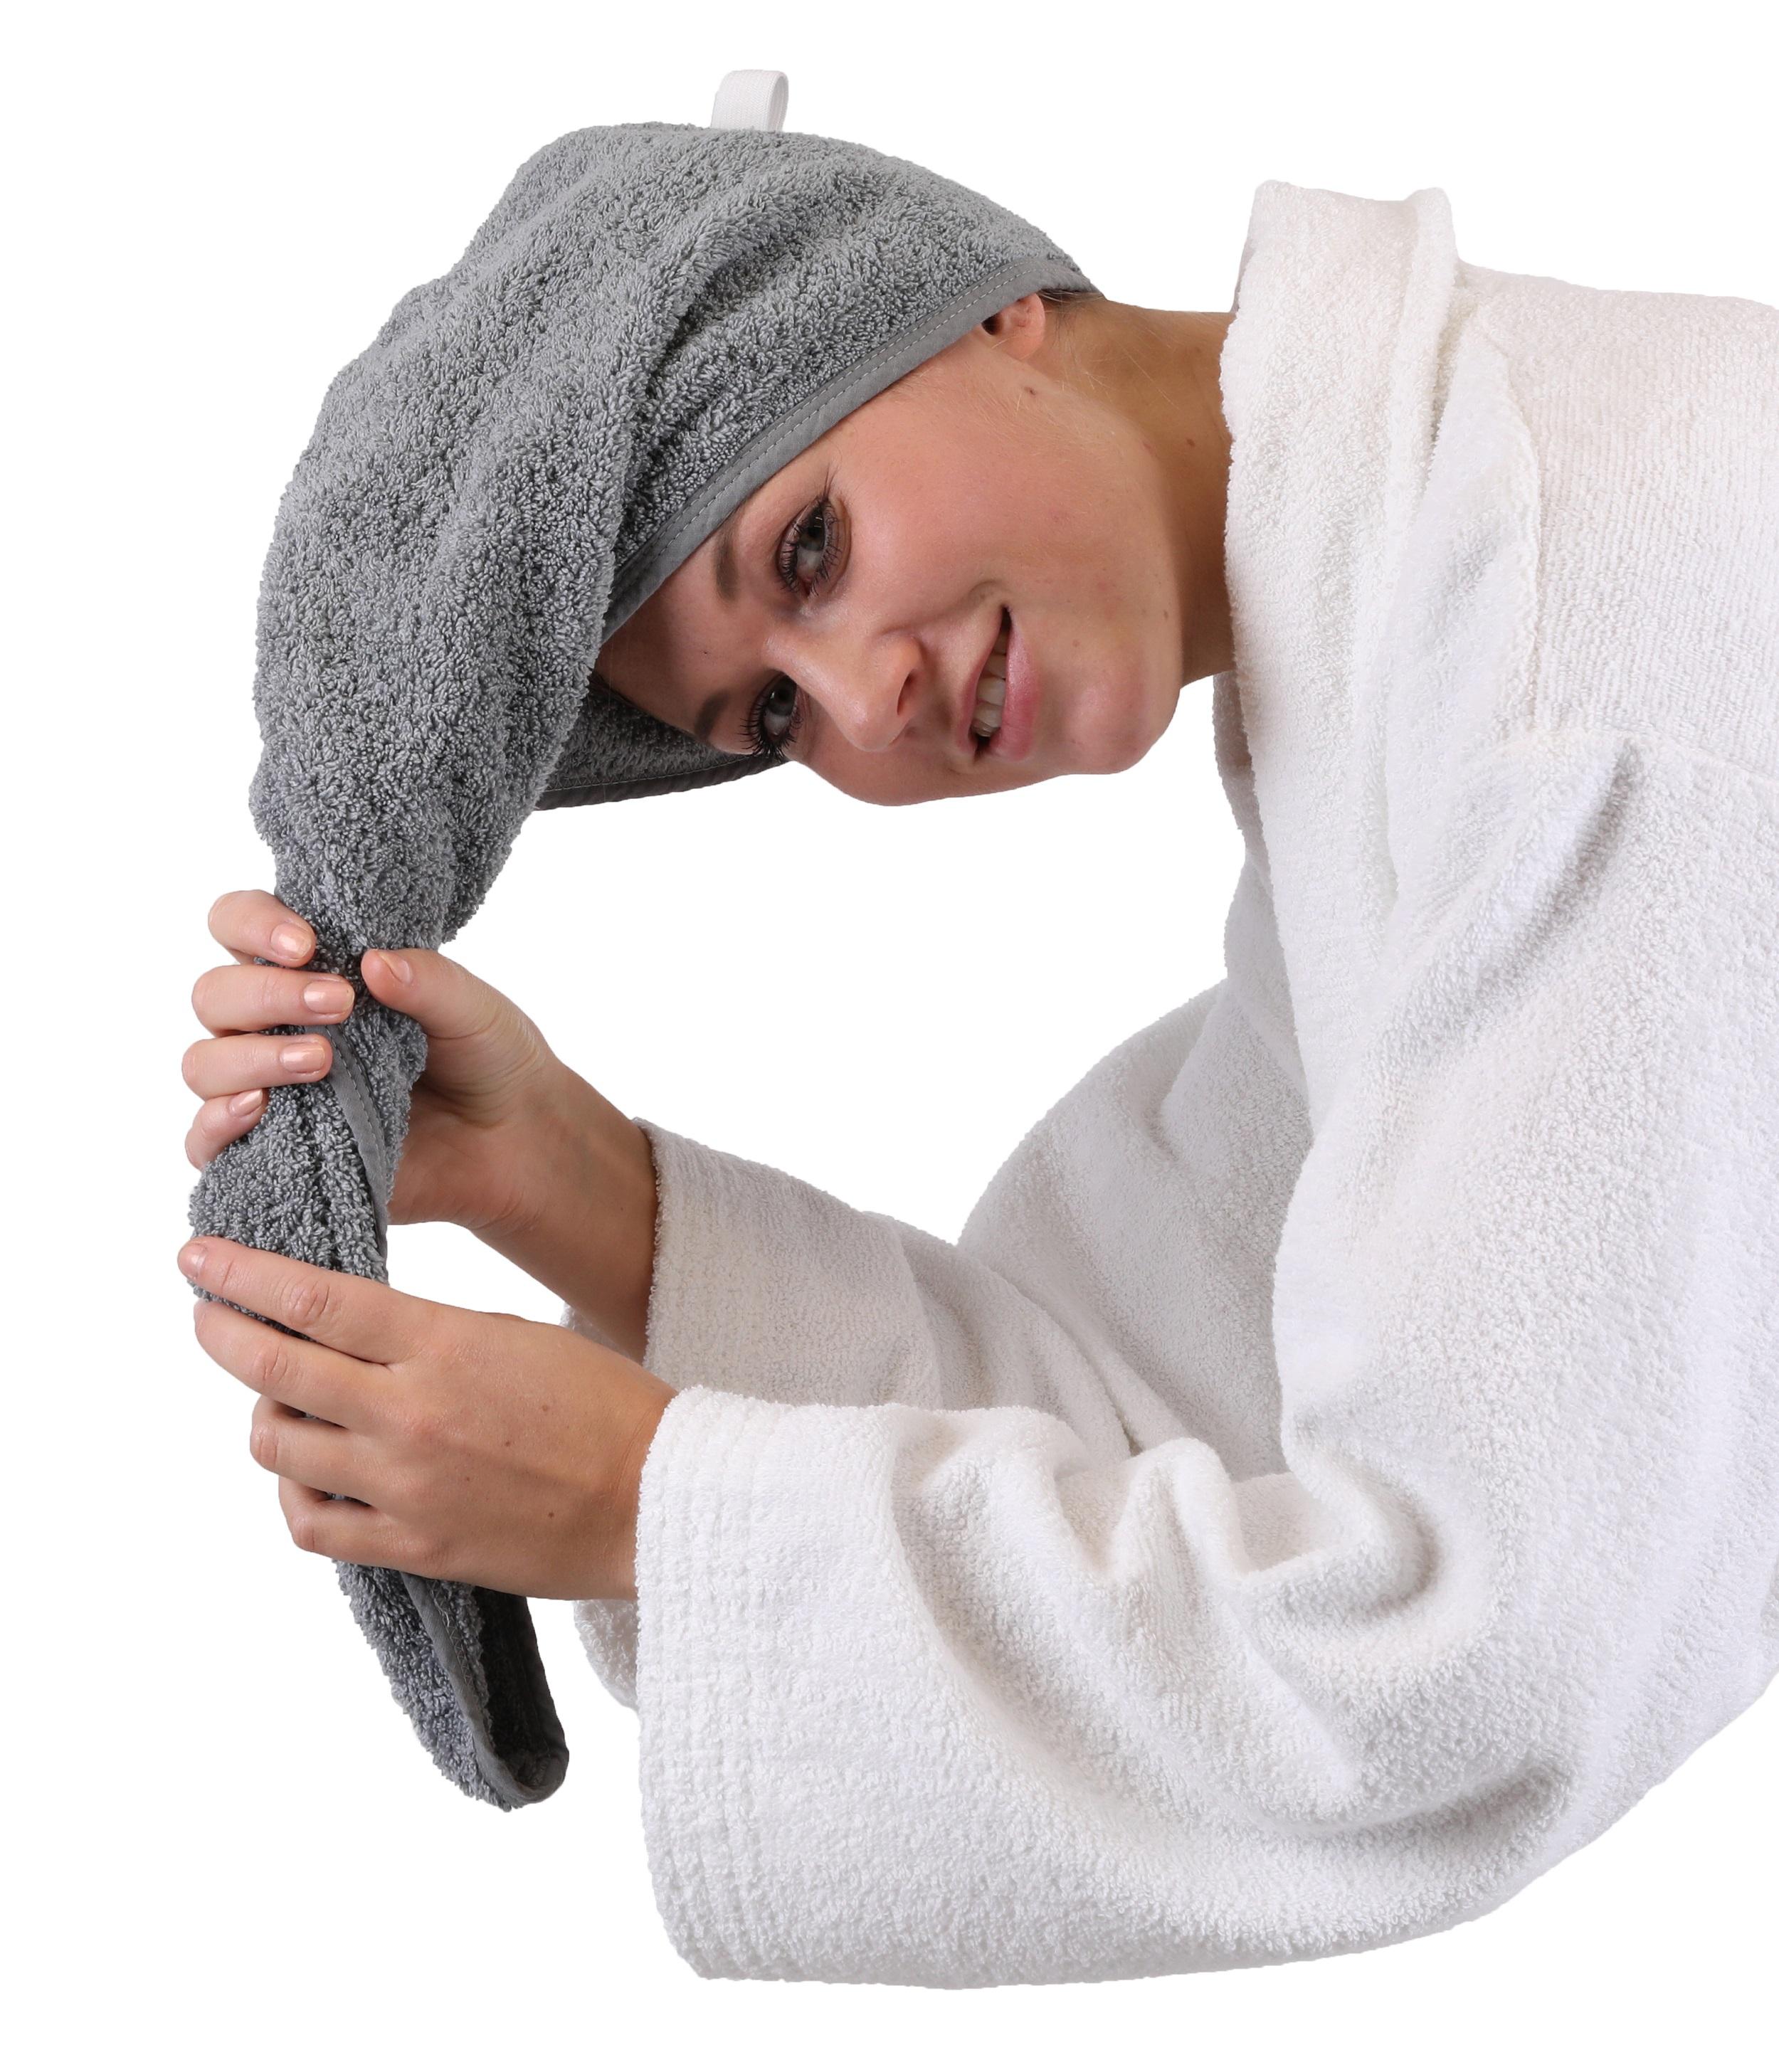 betz 2er set turban handt cher haarturban kopftuch 100. Black Bedroom Furniture Sets. Home Design Ideas